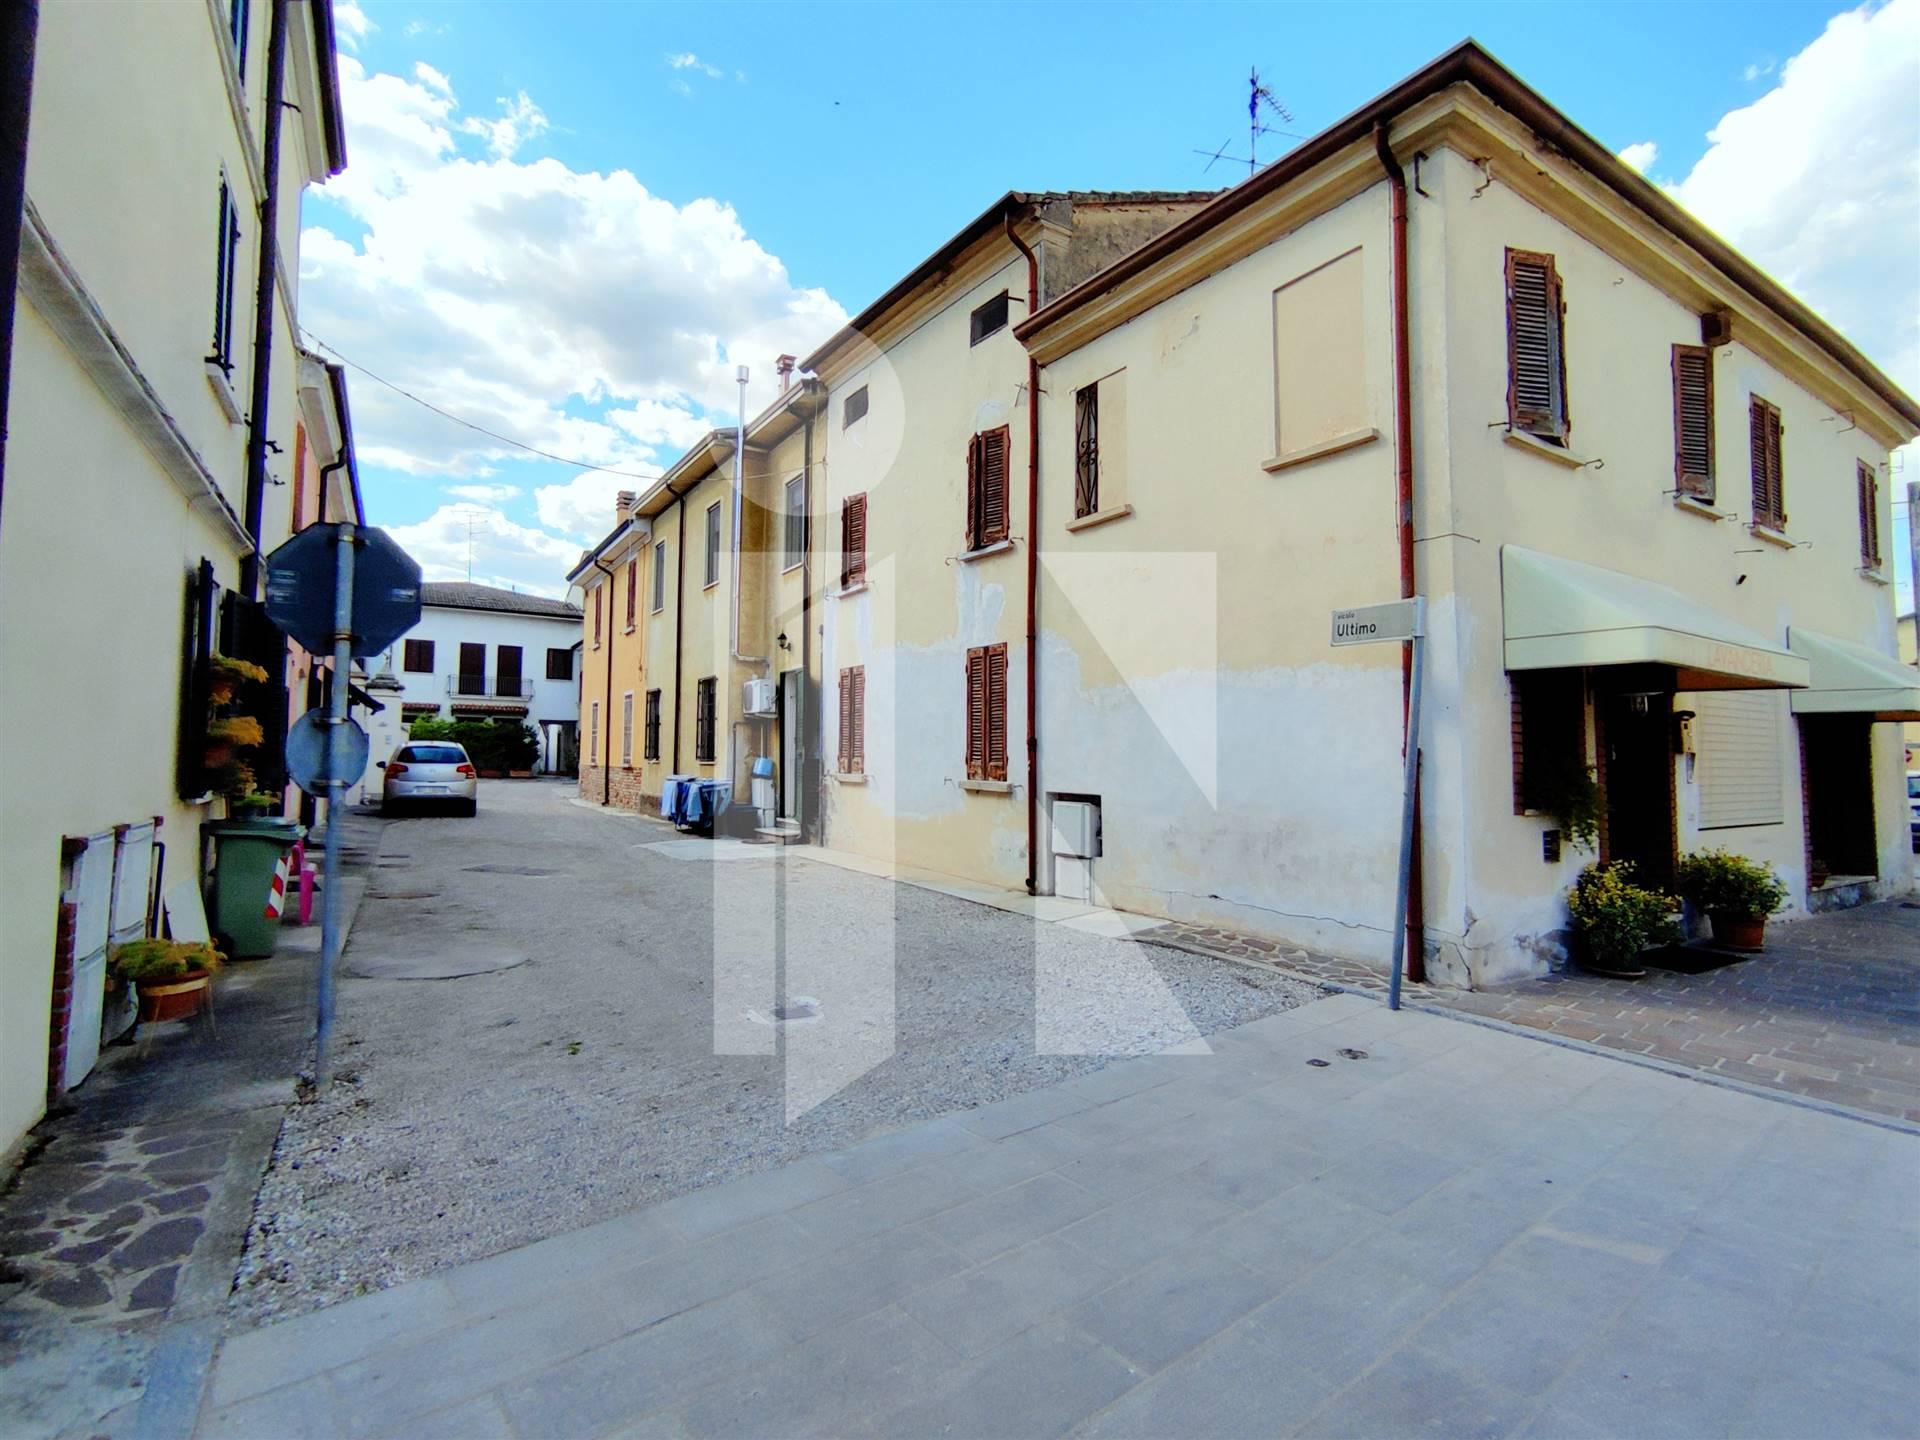 Casetta in centro paese